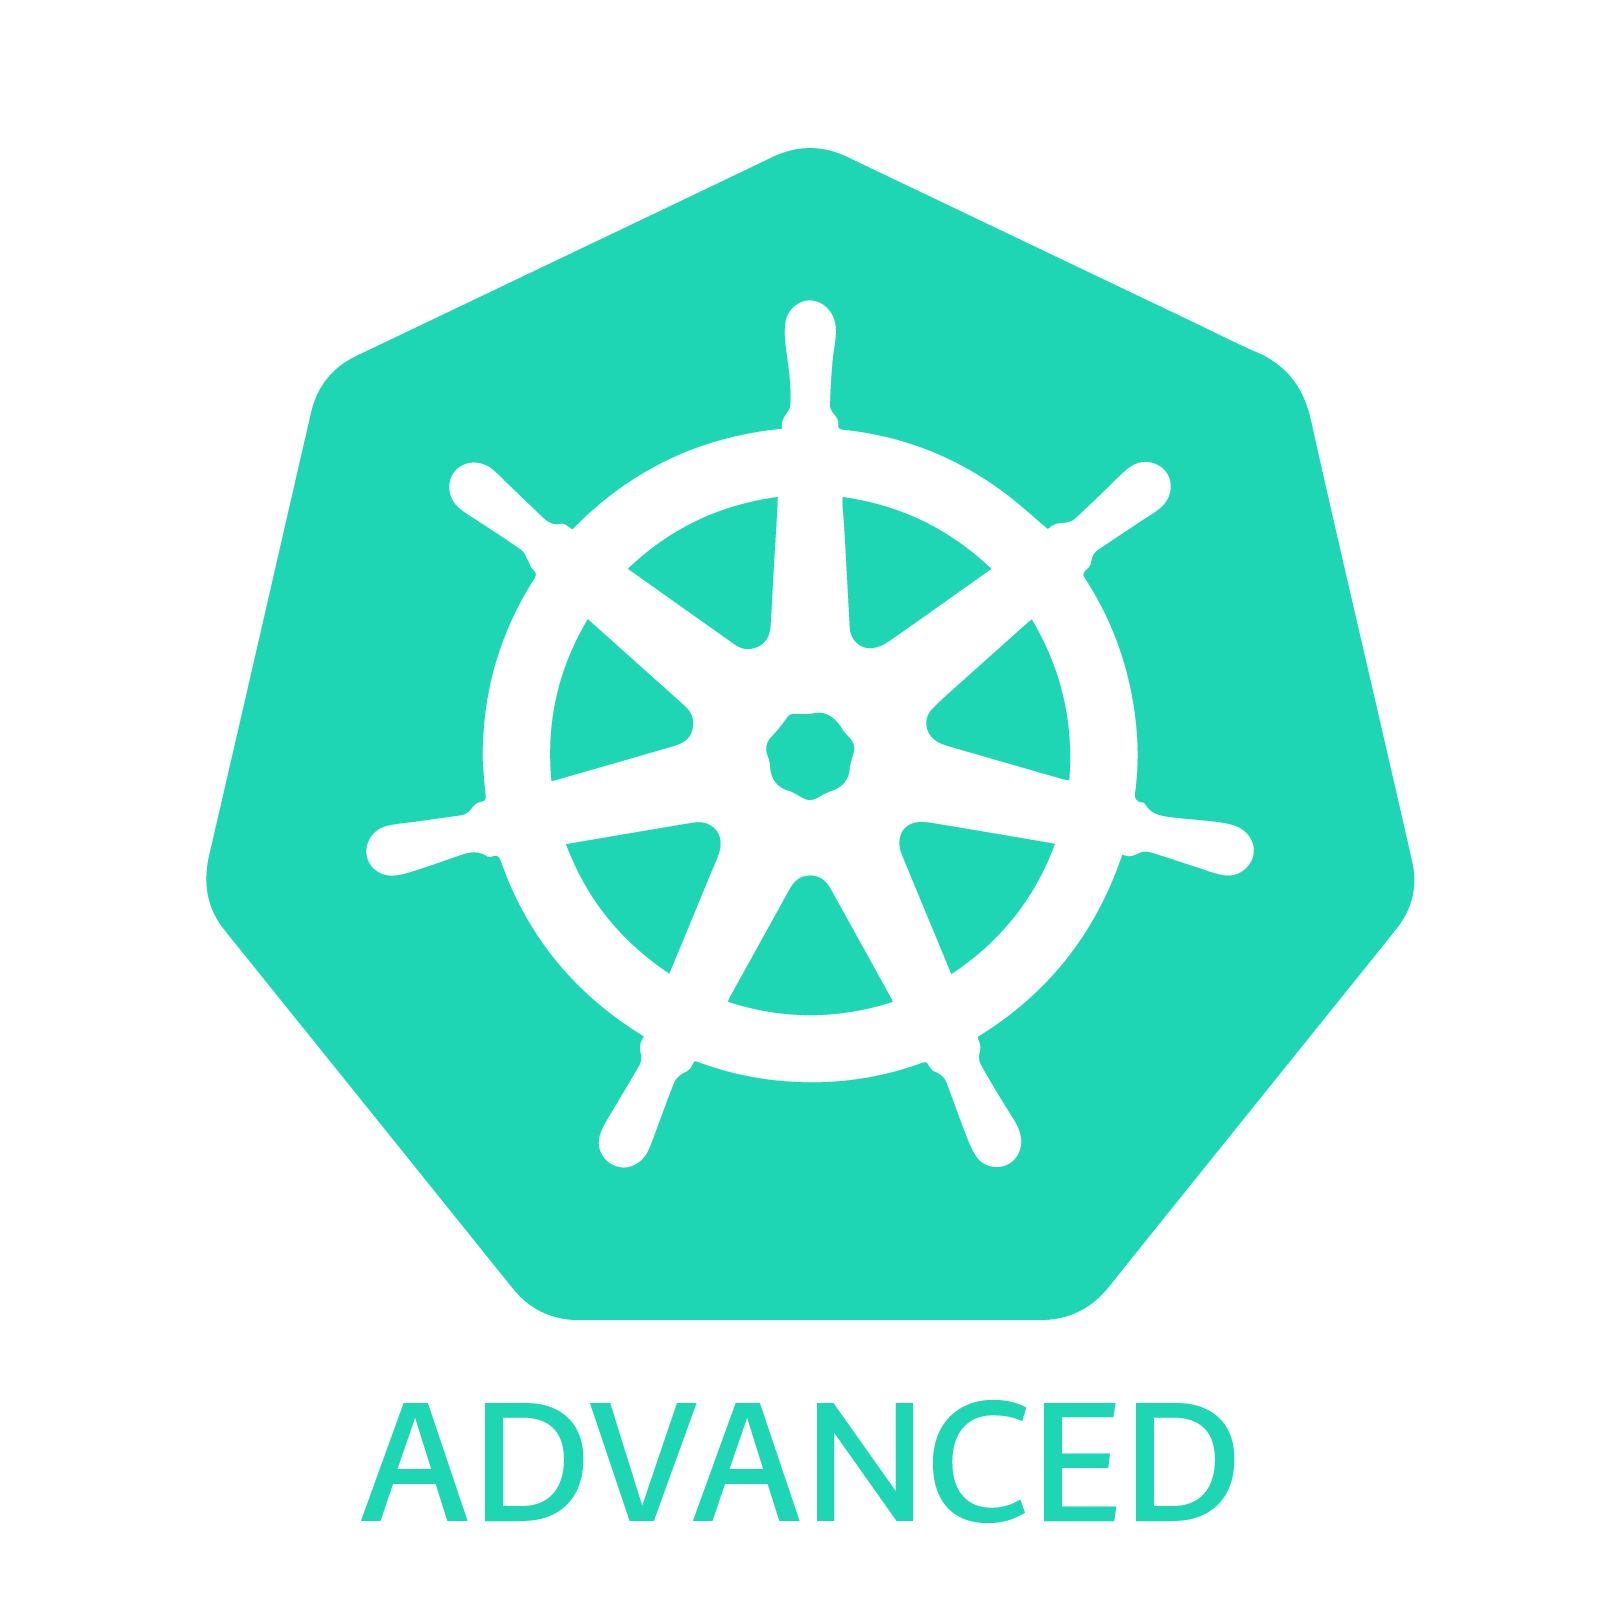 Kubernetes Advanced